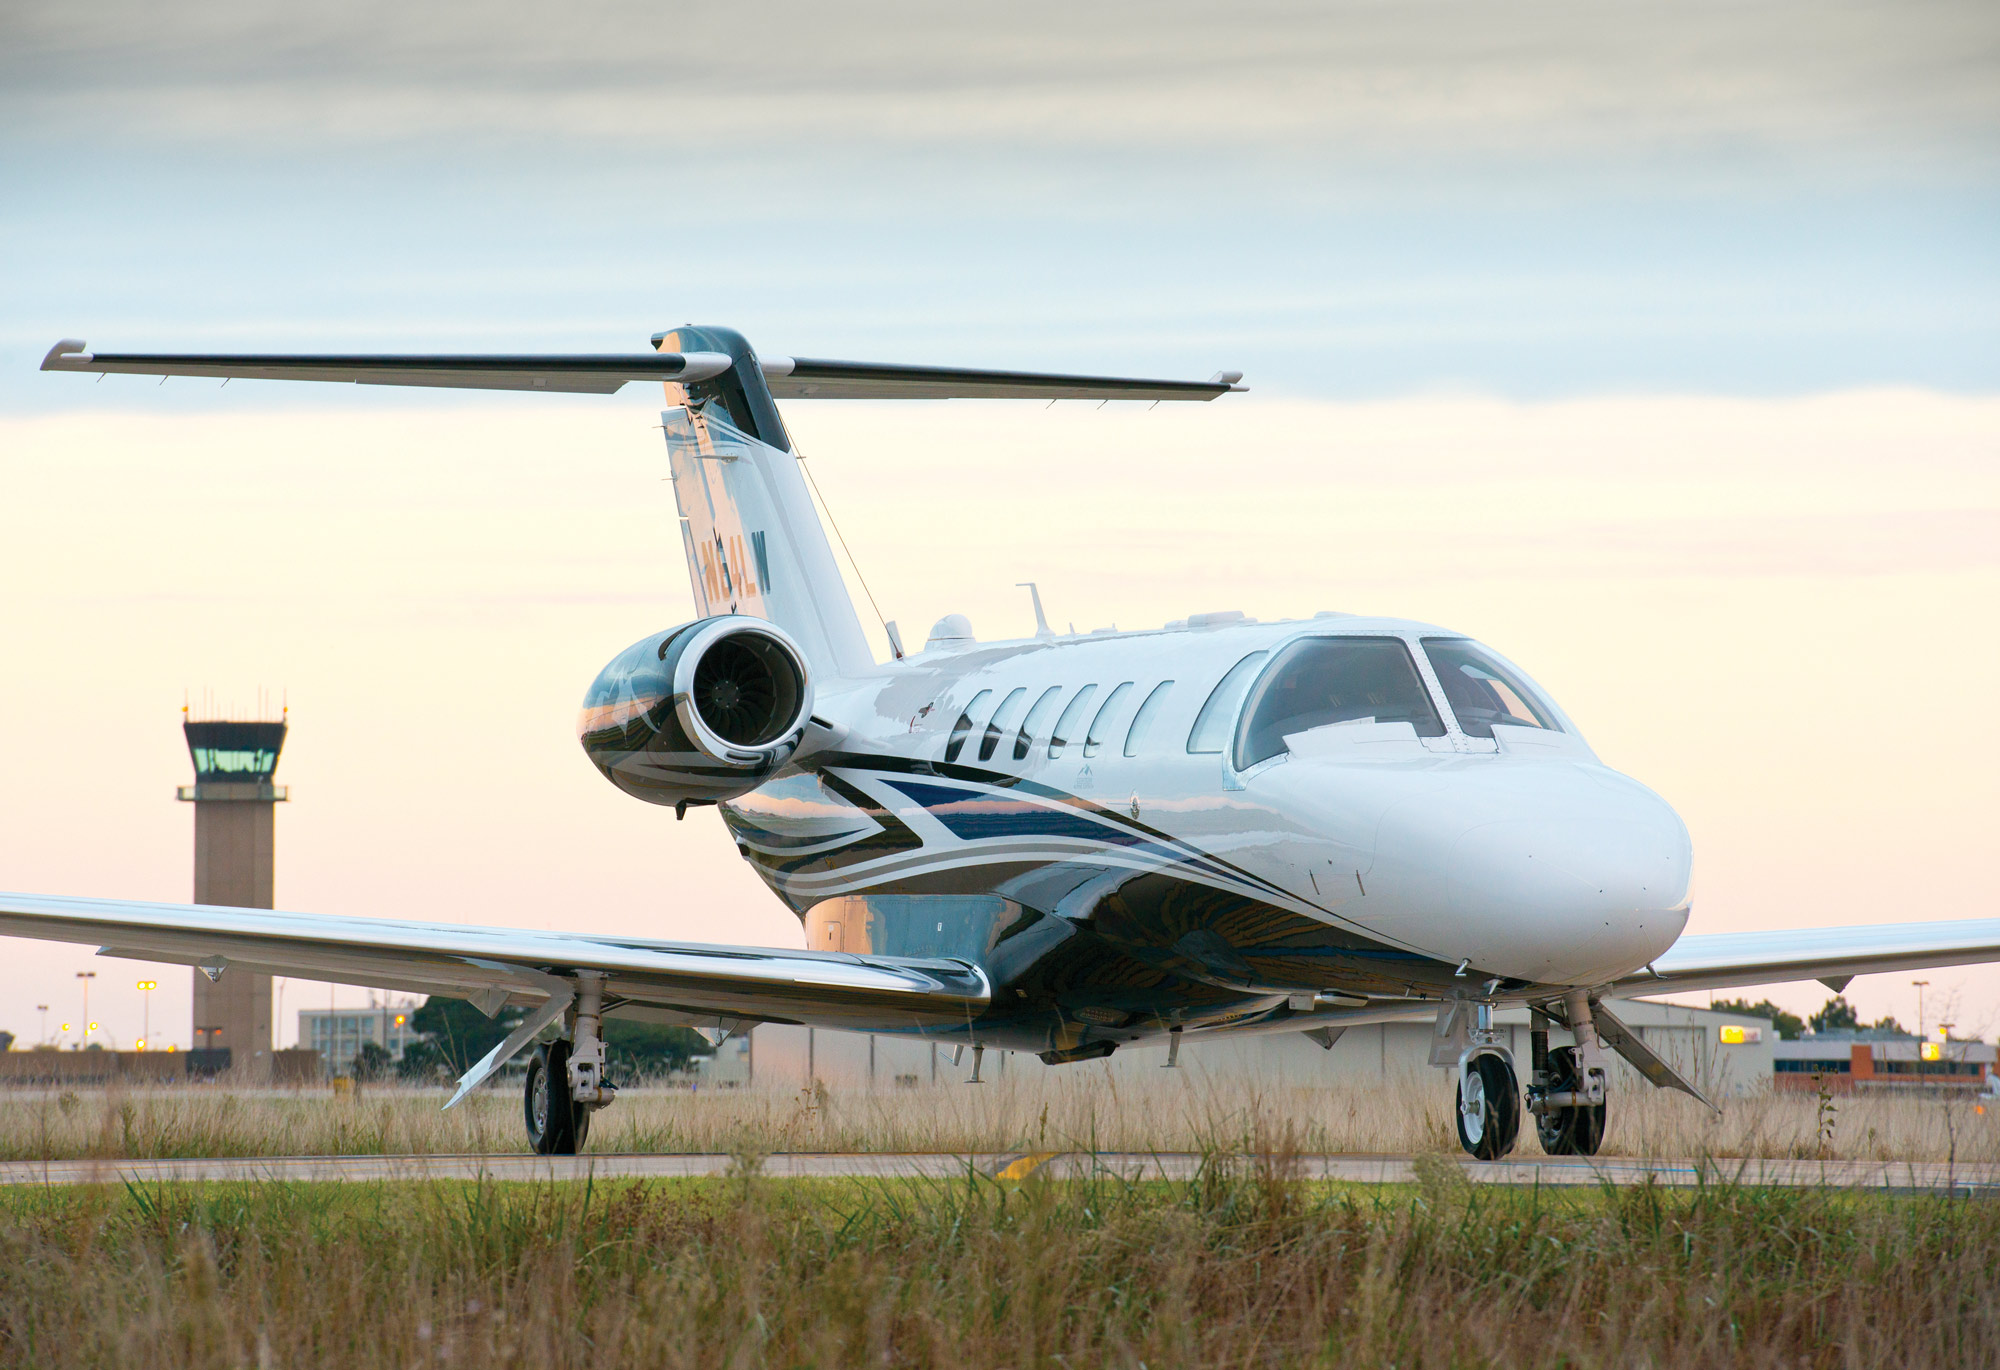 Citation_CJ2_Exterior_Light-Jet_Legacy_Aviation_Private_Jet_NetJets_jet_charter_TEB_VNY_MIA_PBI_FRG_SFO_FLL_FXE_BED.jpg